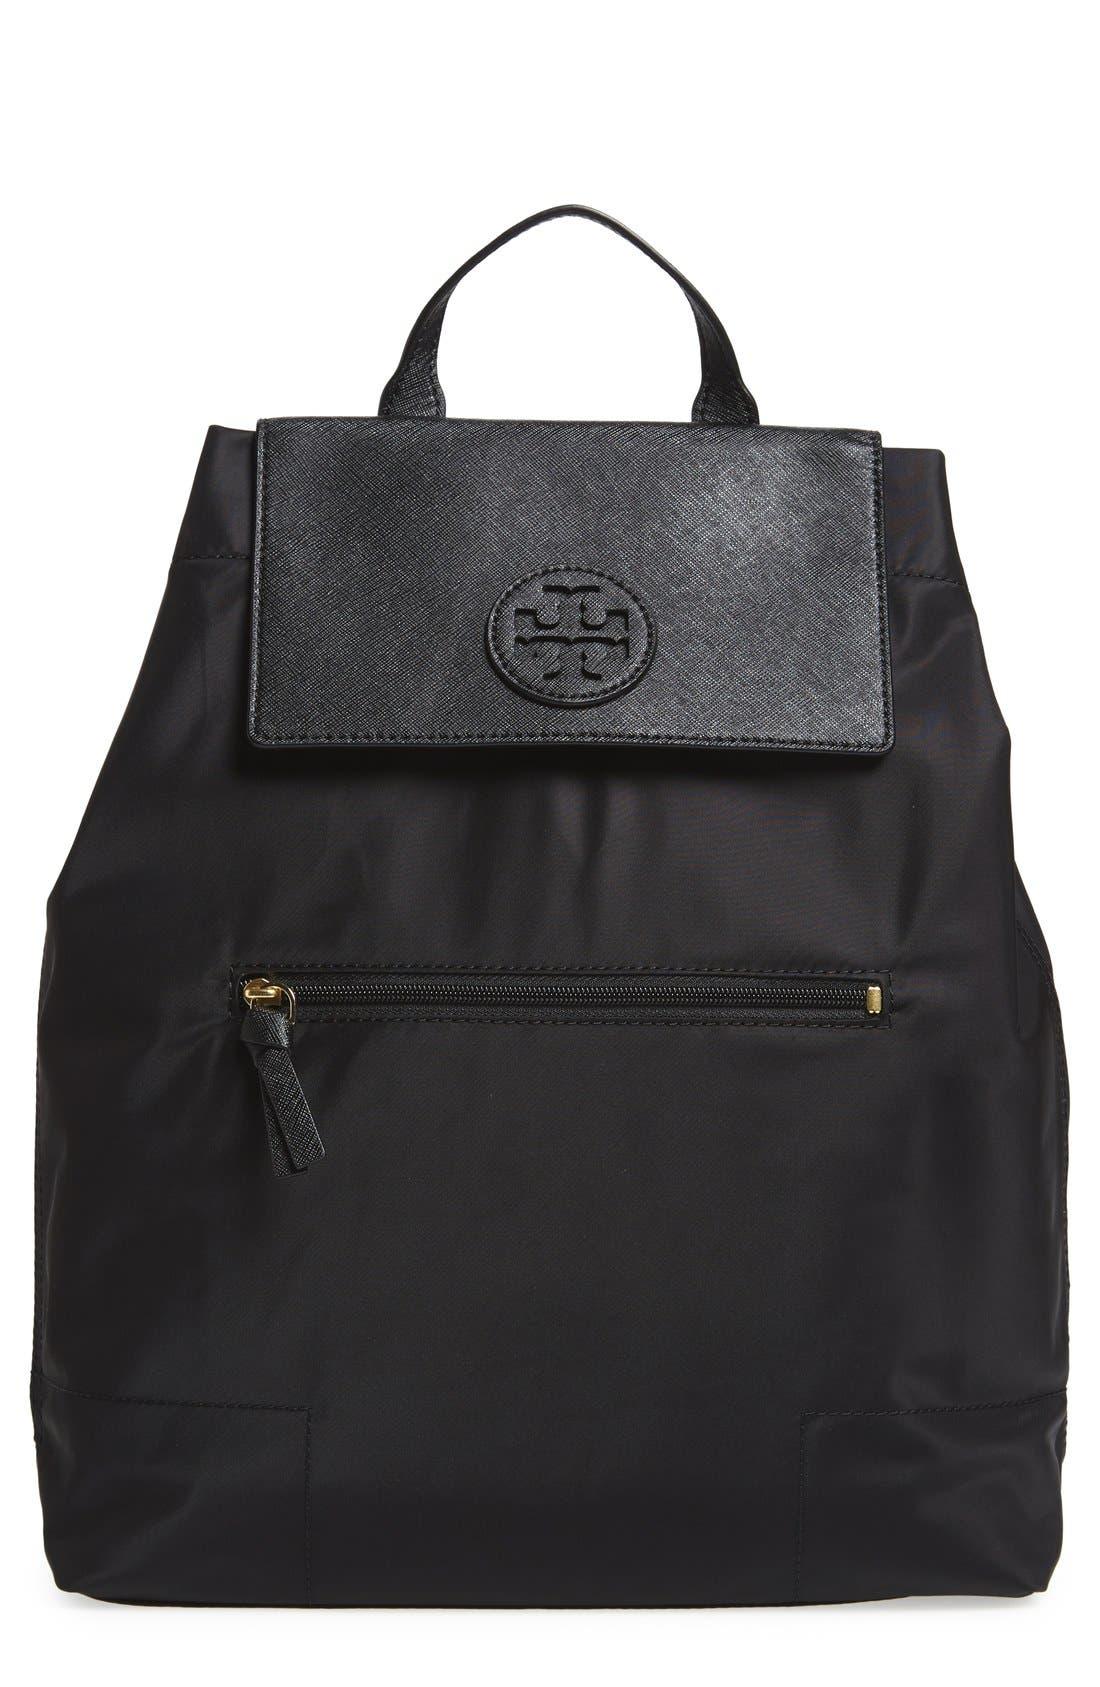 Alternate Image 1 Selected - Tory Burch 'Ella' Packable Nylon Backpack